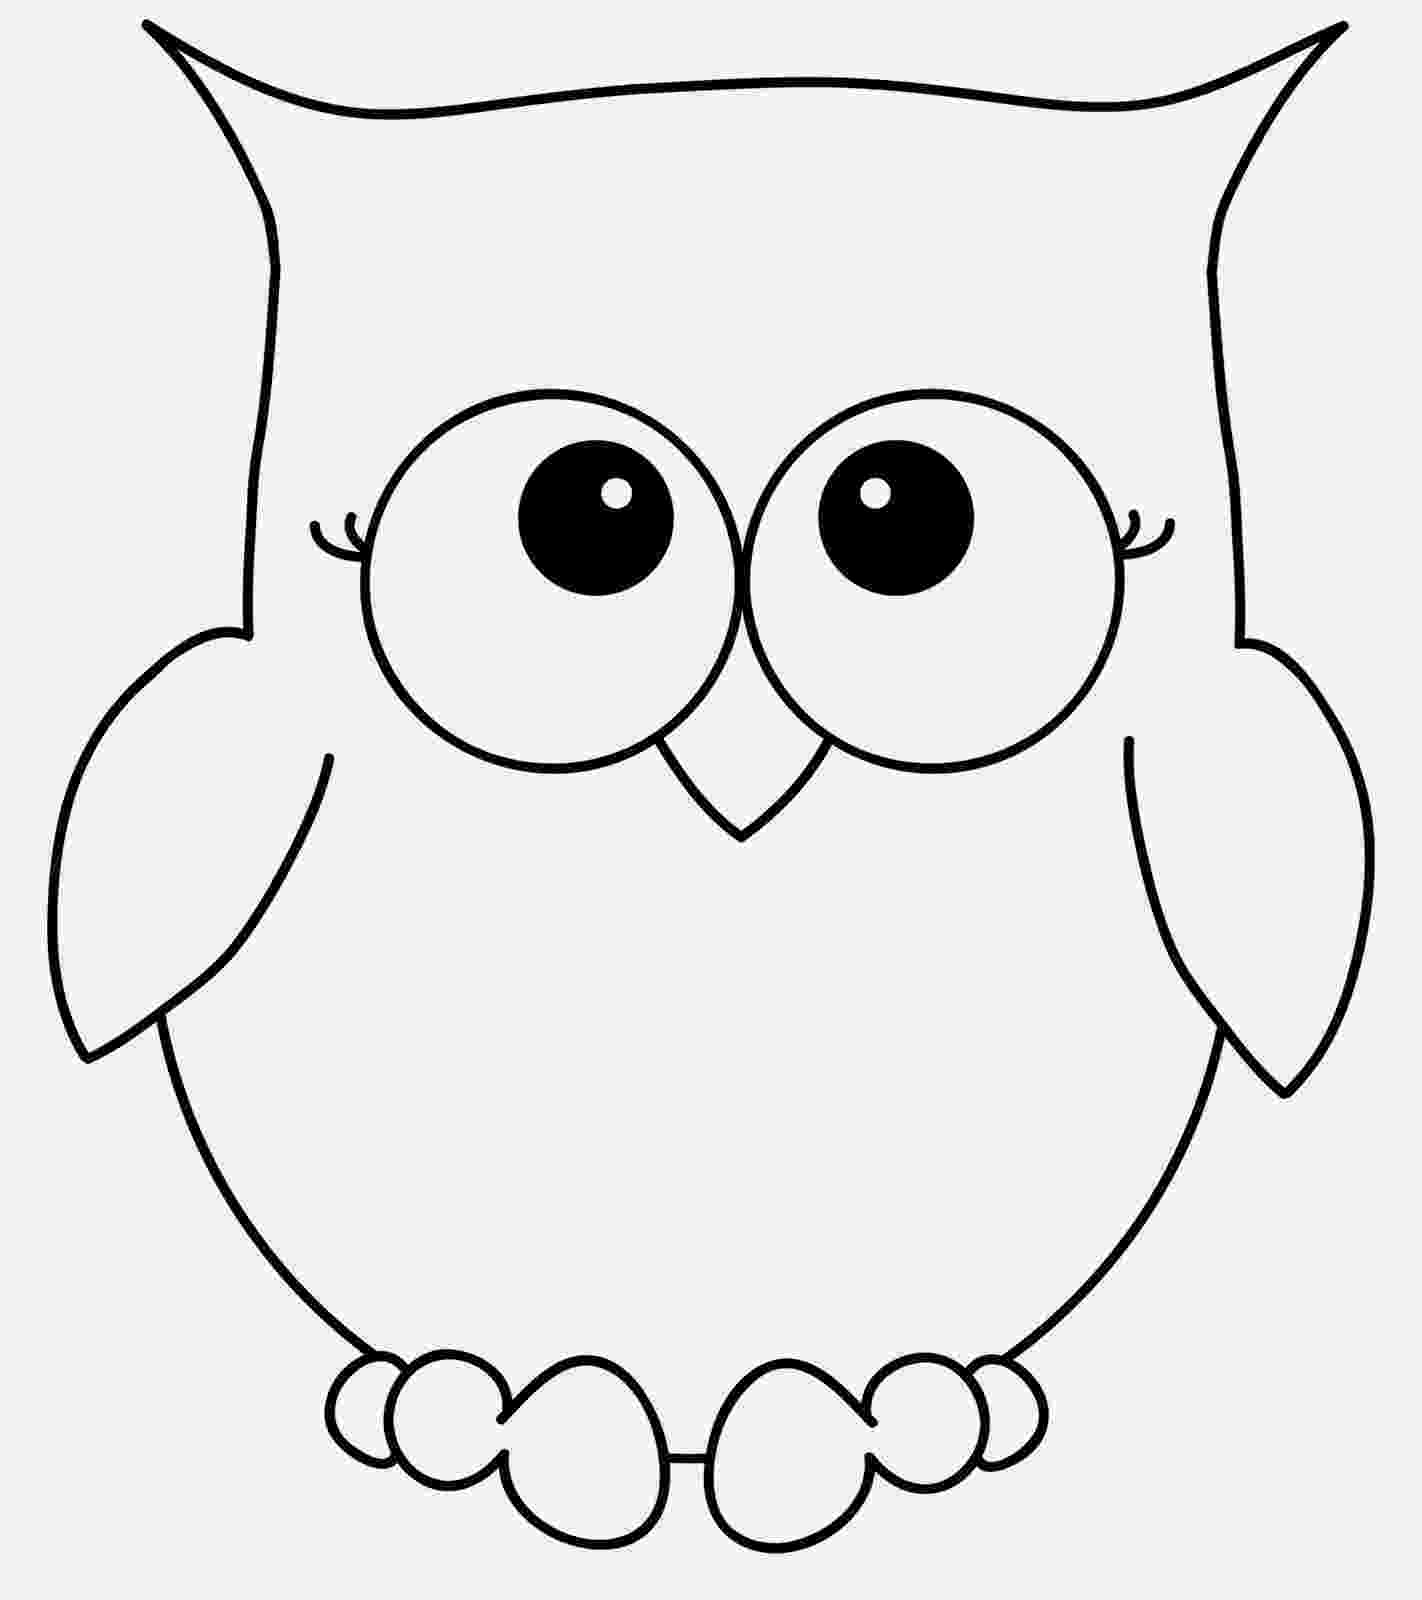 printable owl images selimut ku cute lil39 owl owl images printable